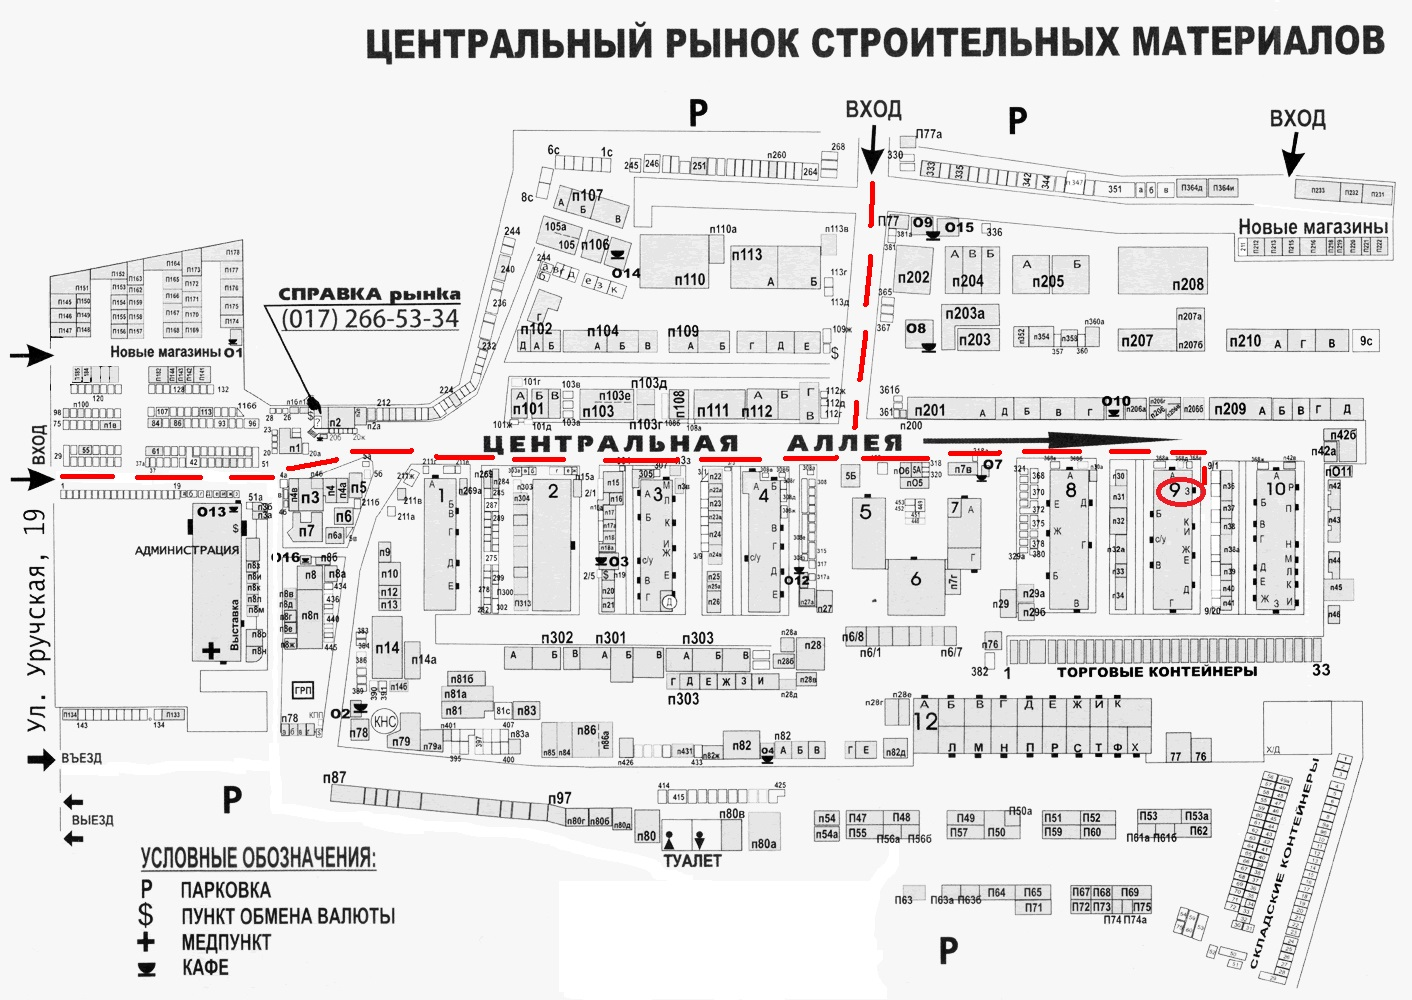 map_.gif